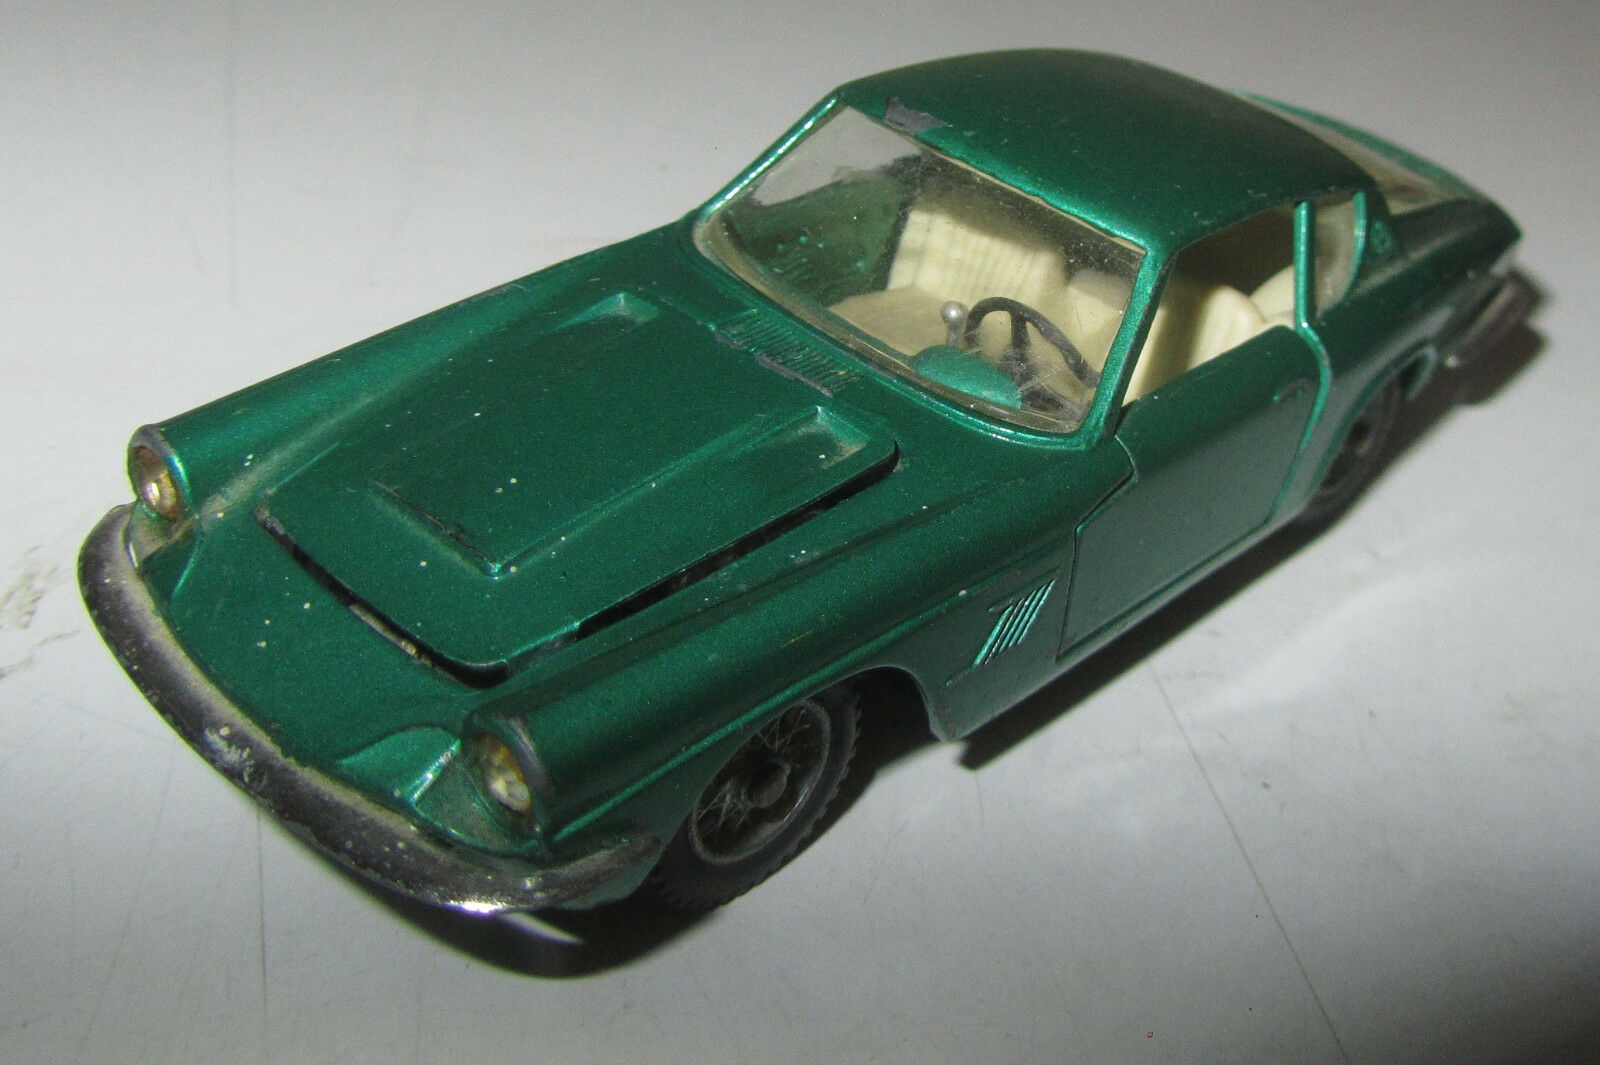 Mebetoys Maserati Mistral Coupè 1:43 SPESE GRATIS